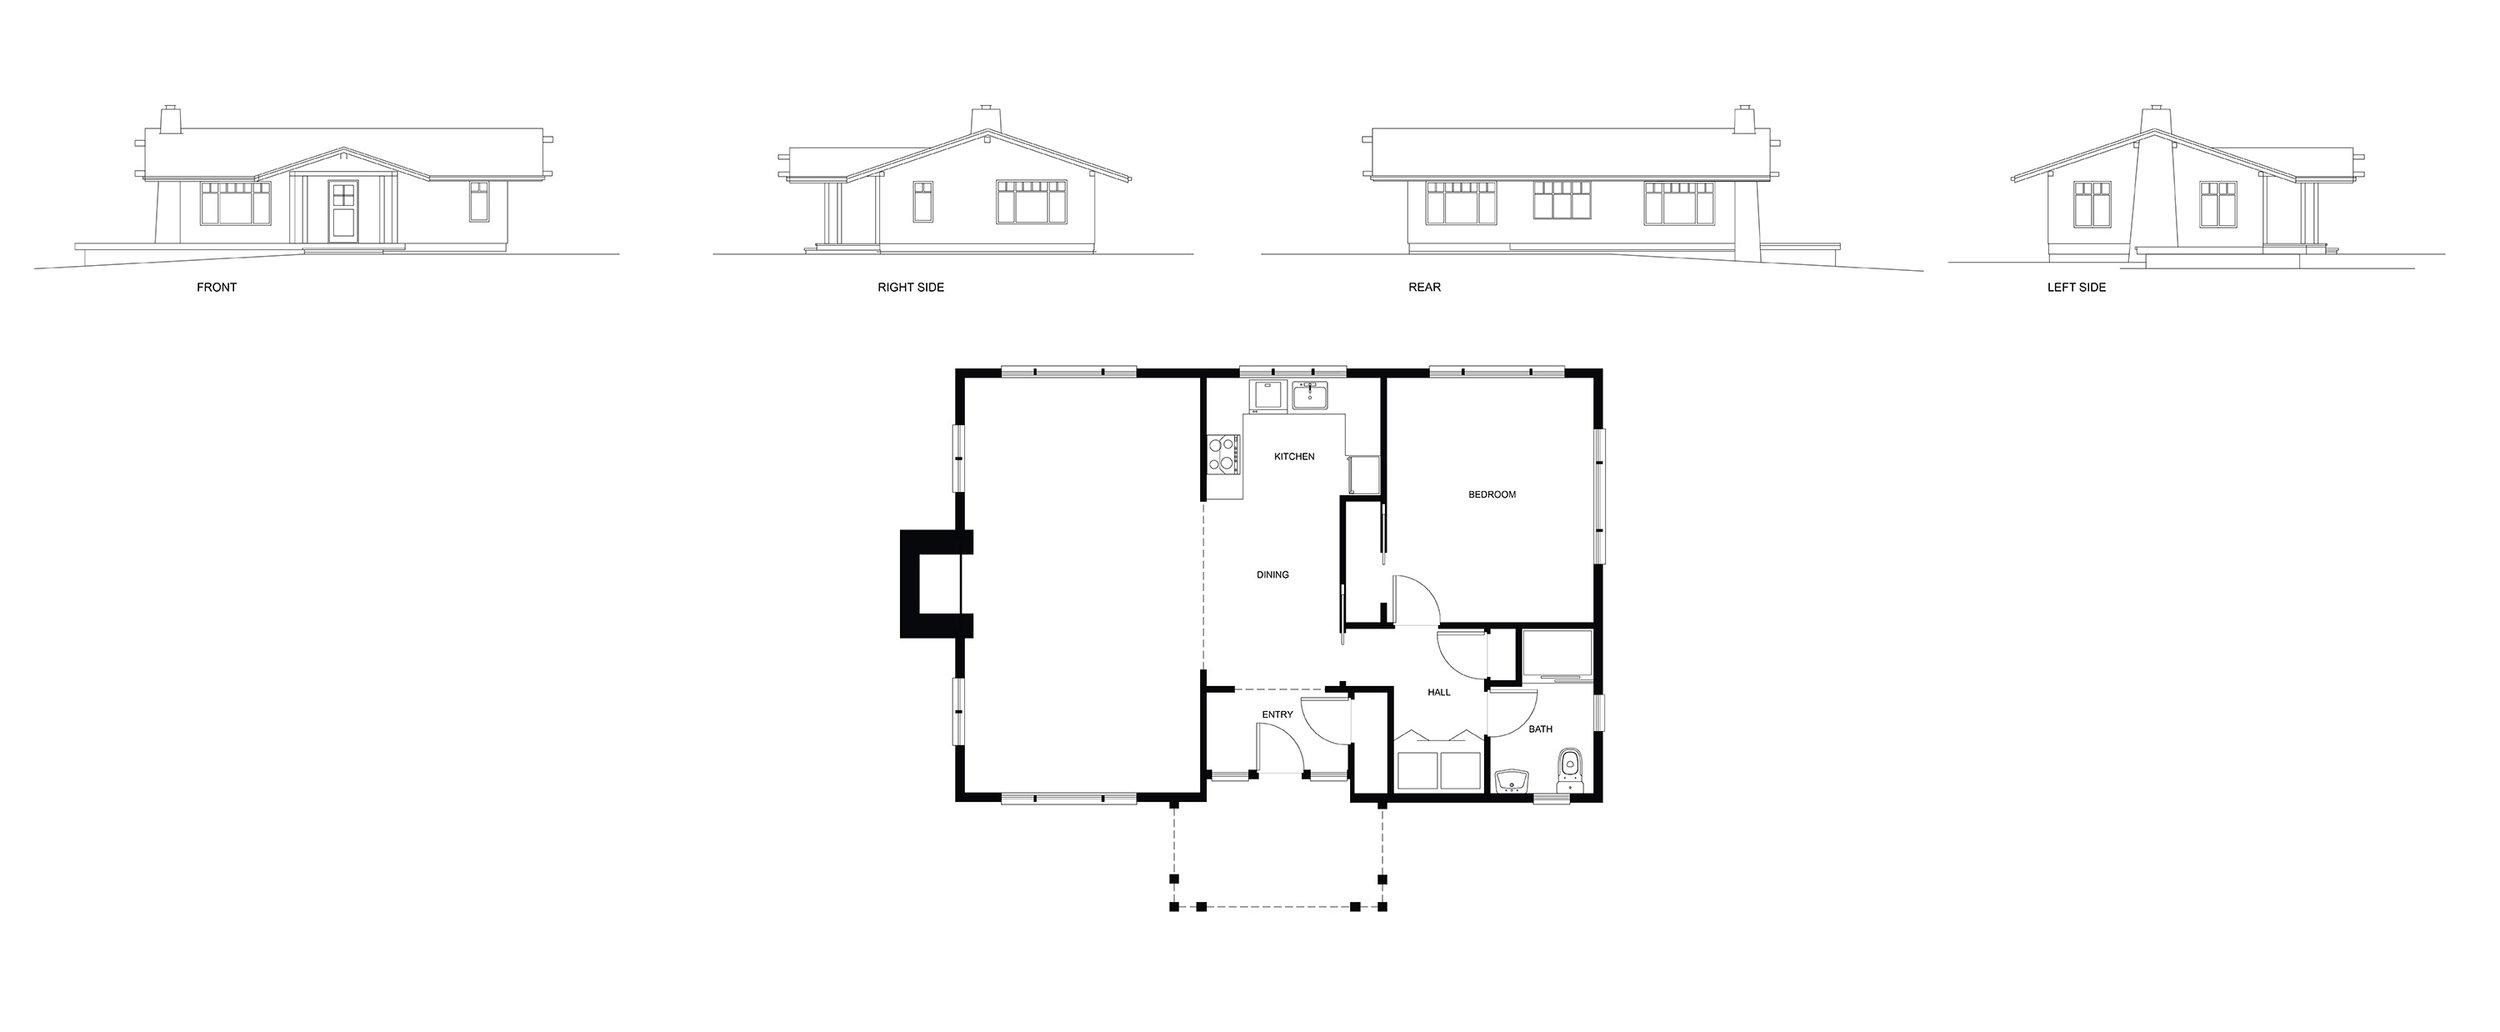 Guest House Elevations & Floor Plan